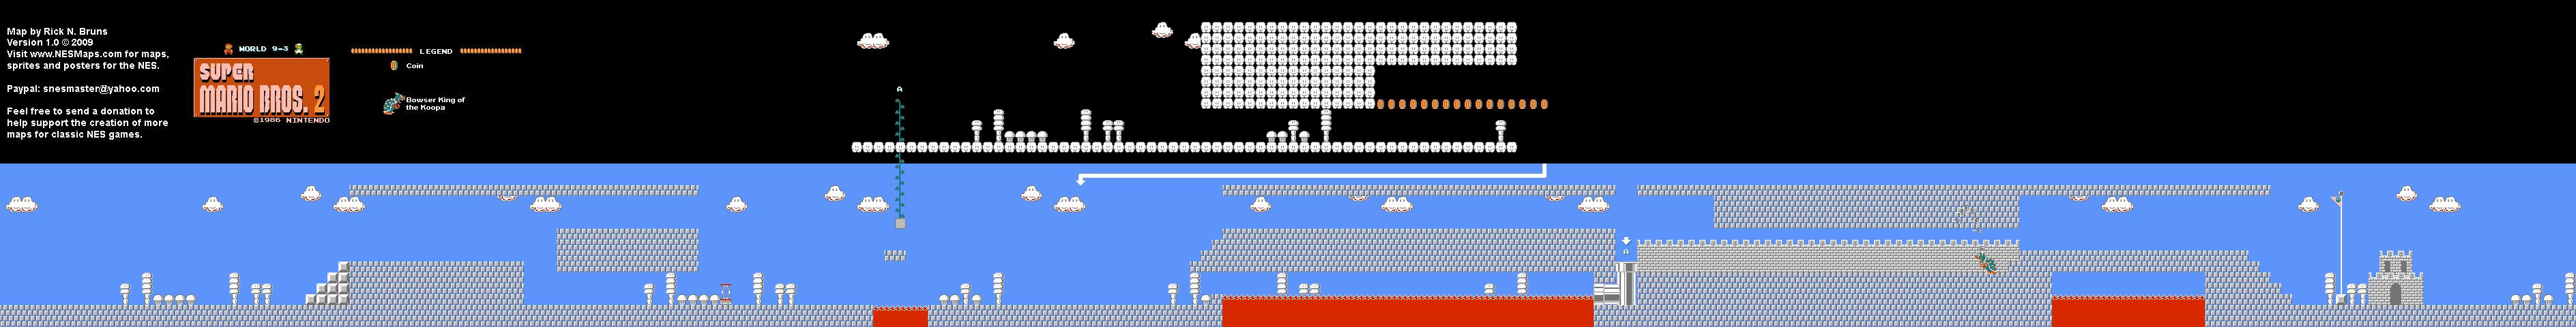 Super Mario Bros 2 Japan The Lost Levels World 9 3 Nintendo